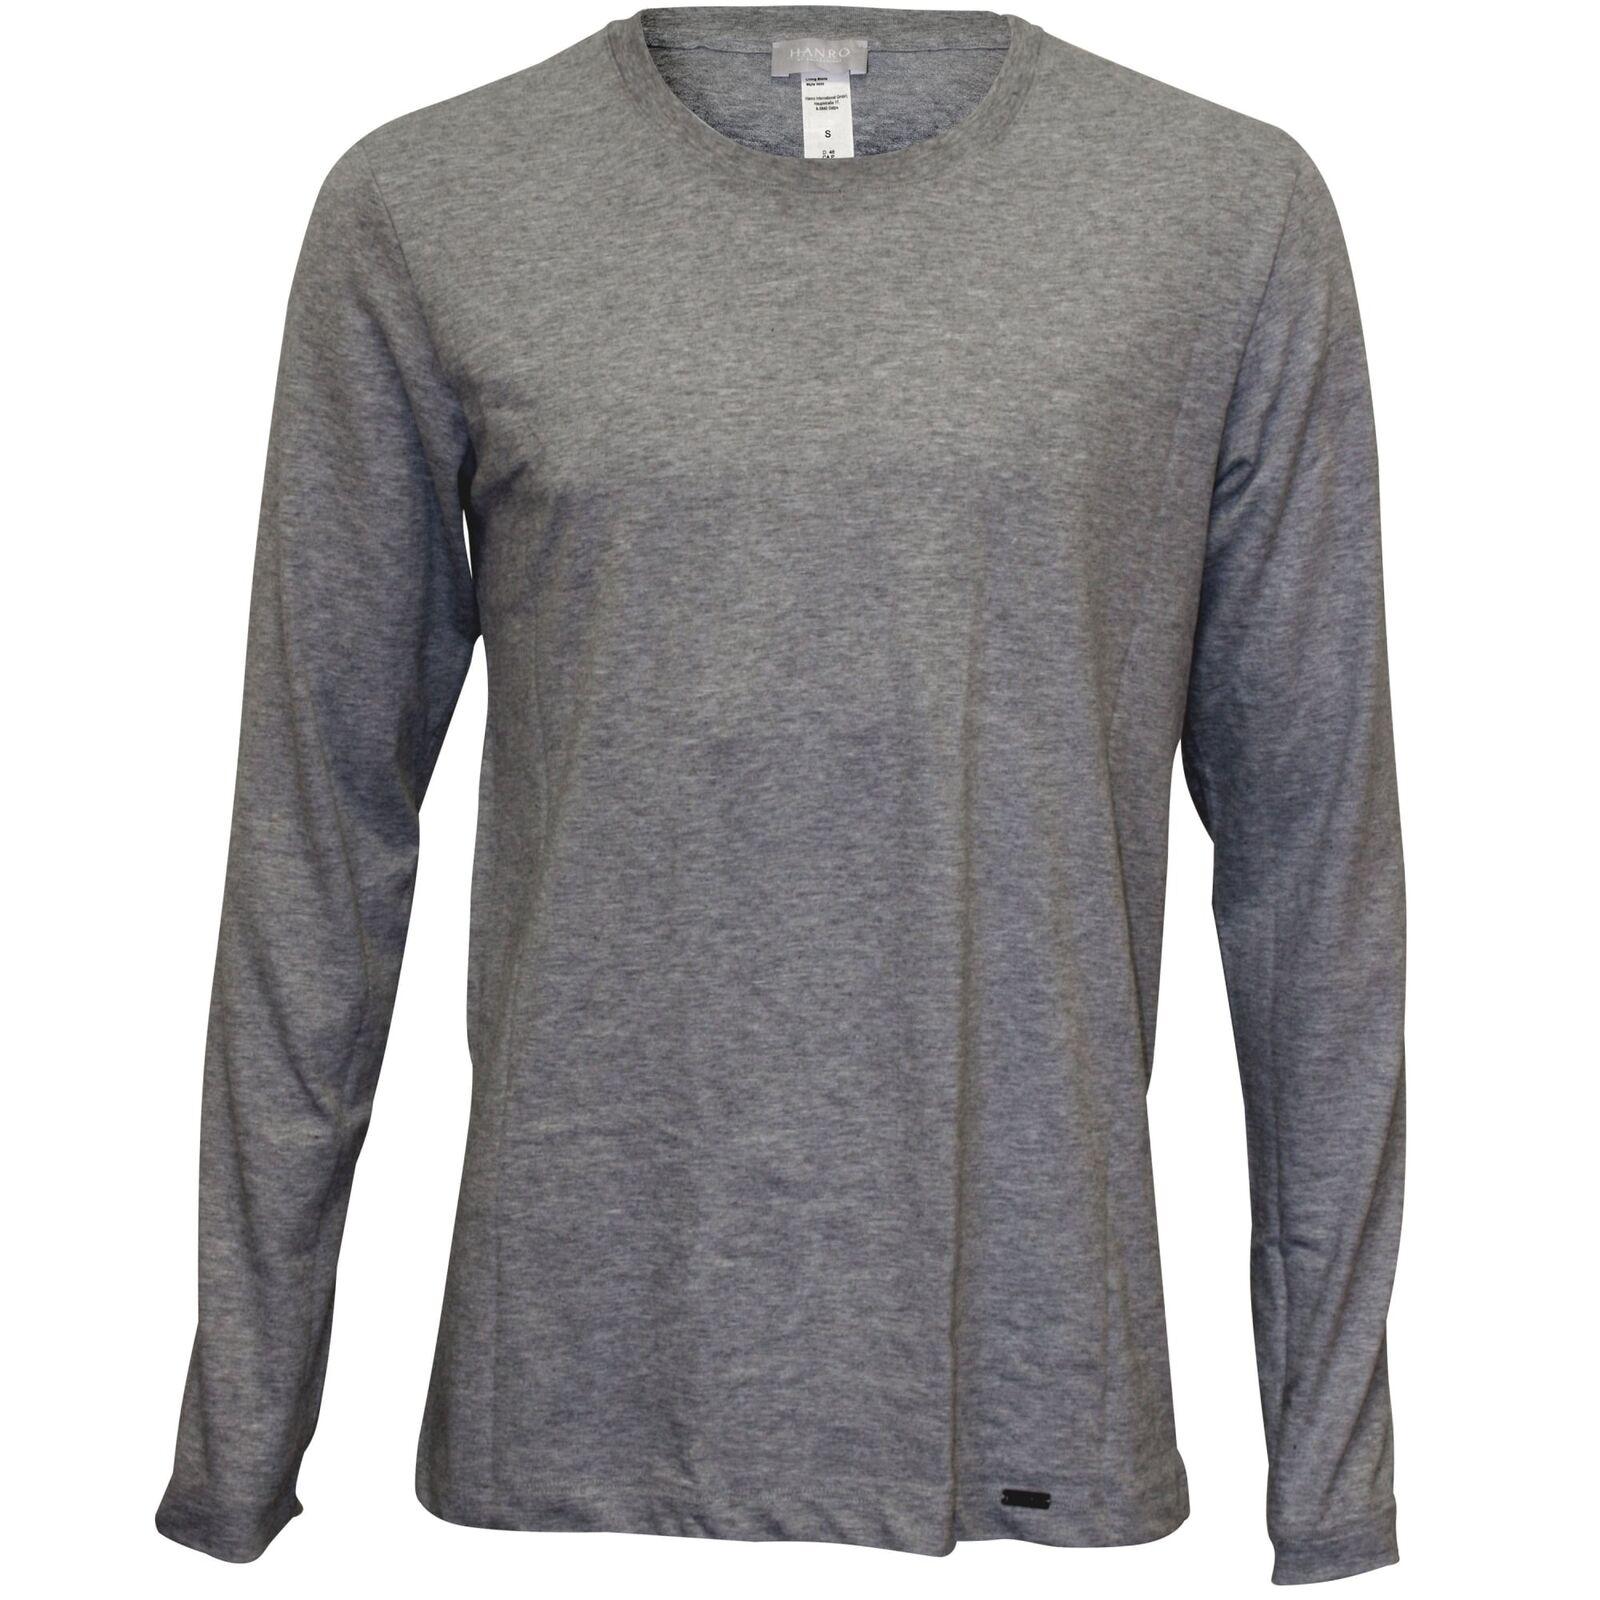 Living Jersey Long-Sleeve T-Shirt, Grau Melange